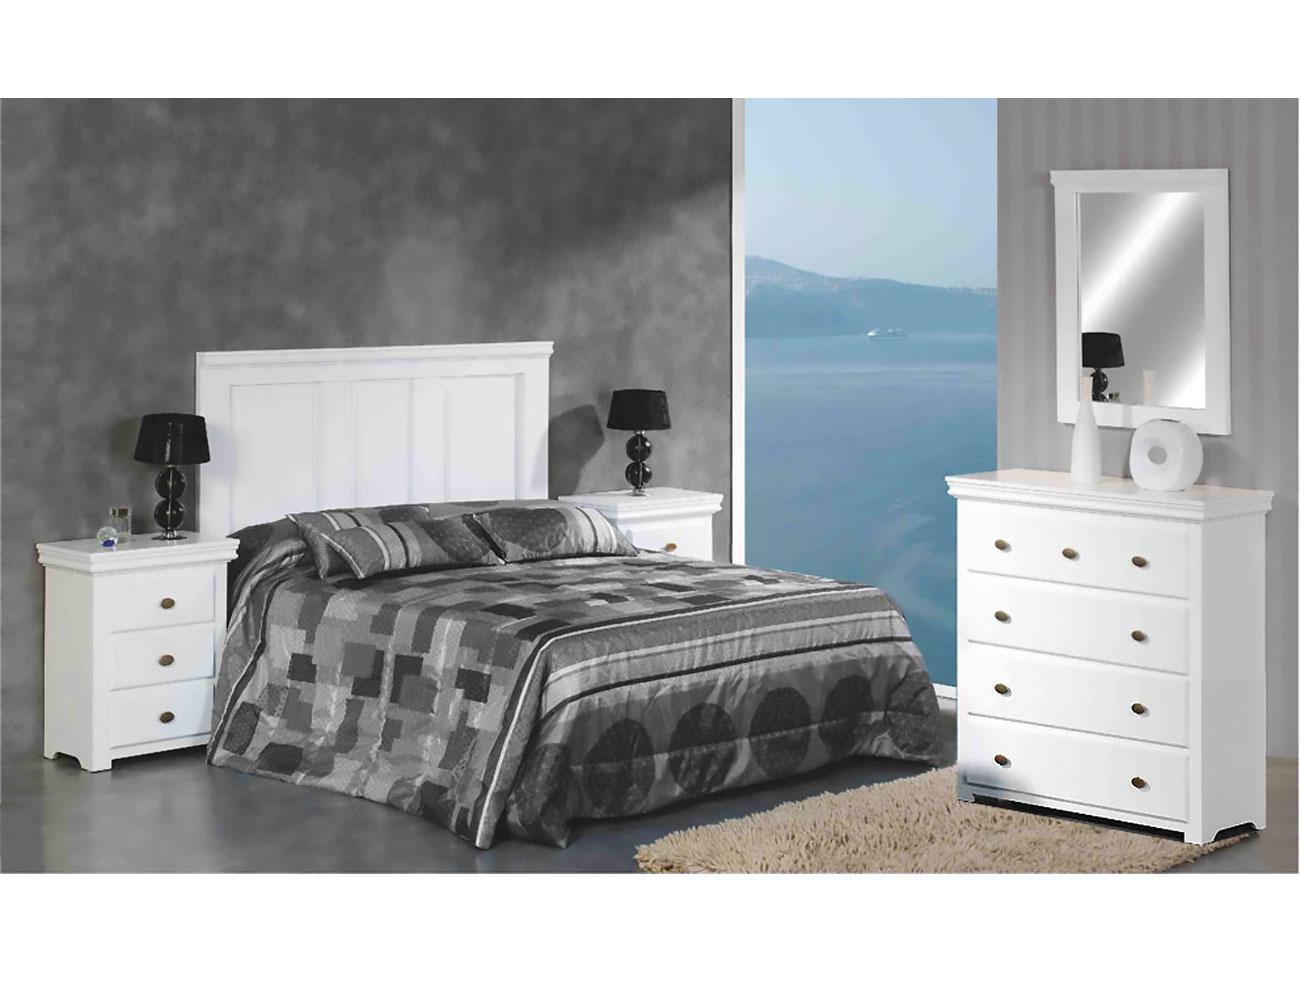 Dormitorio matrimonio comoda 5 c madera dm lacado blanco8